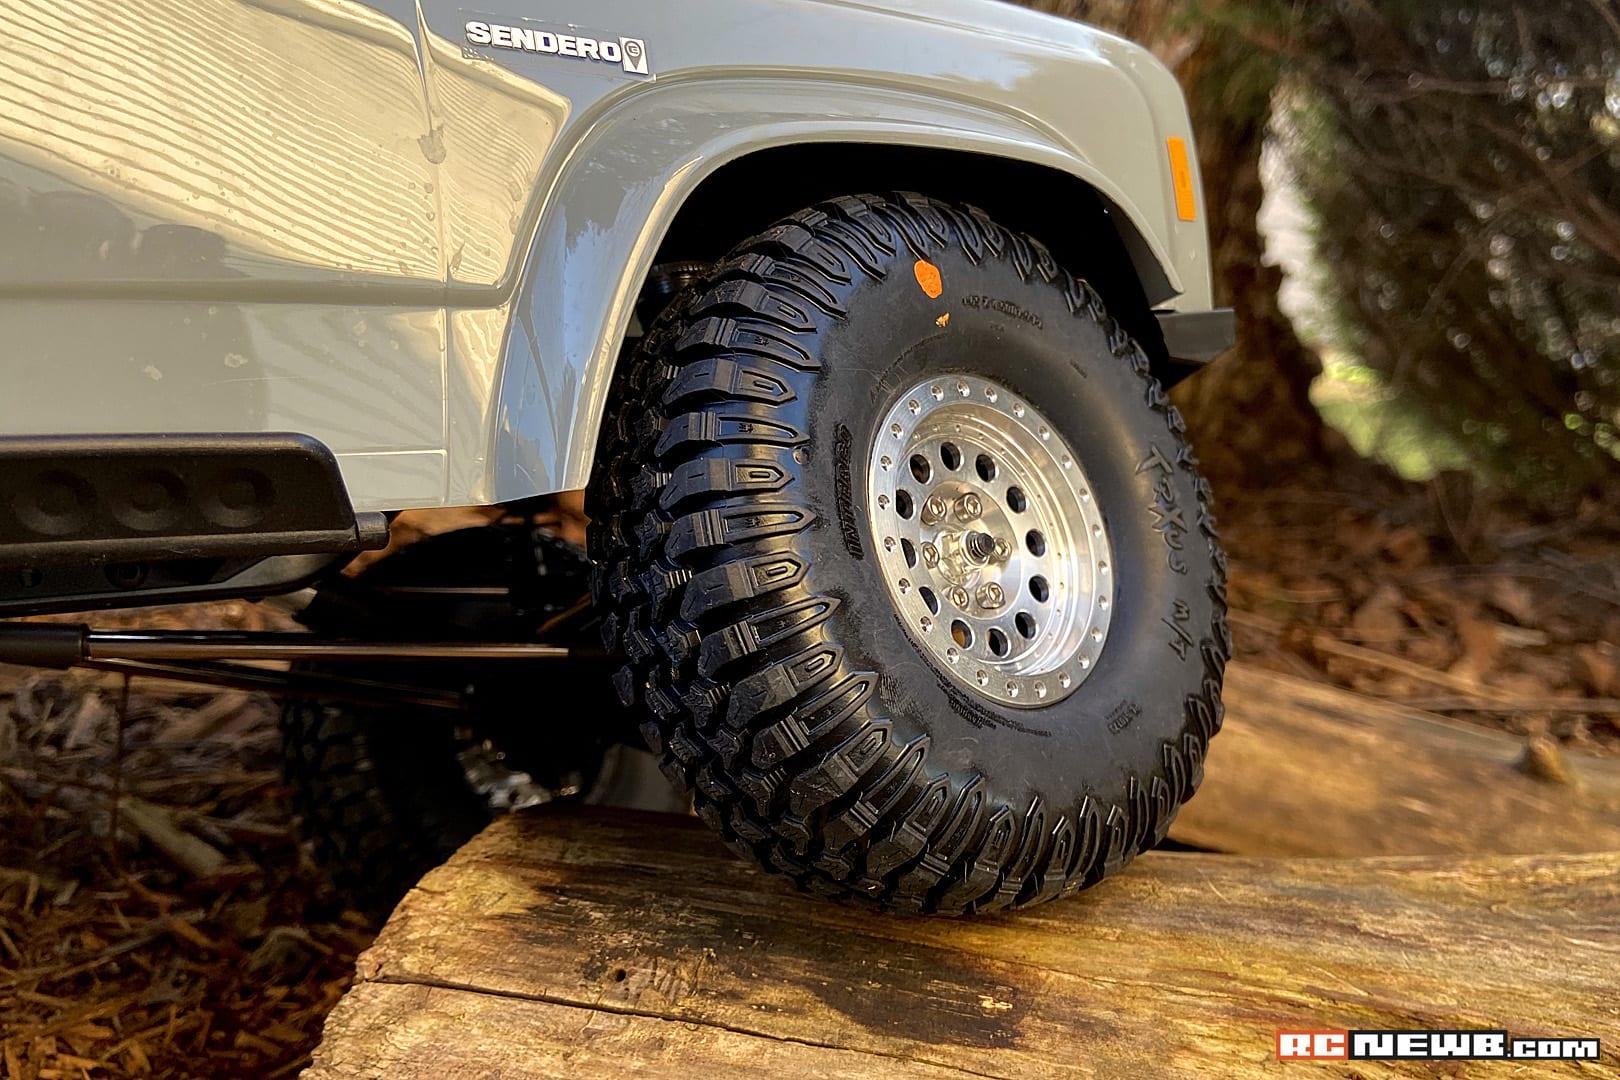 Review: Pro-Line's Interco TrxUs 1.9″ G8 Rock Terrain Tires